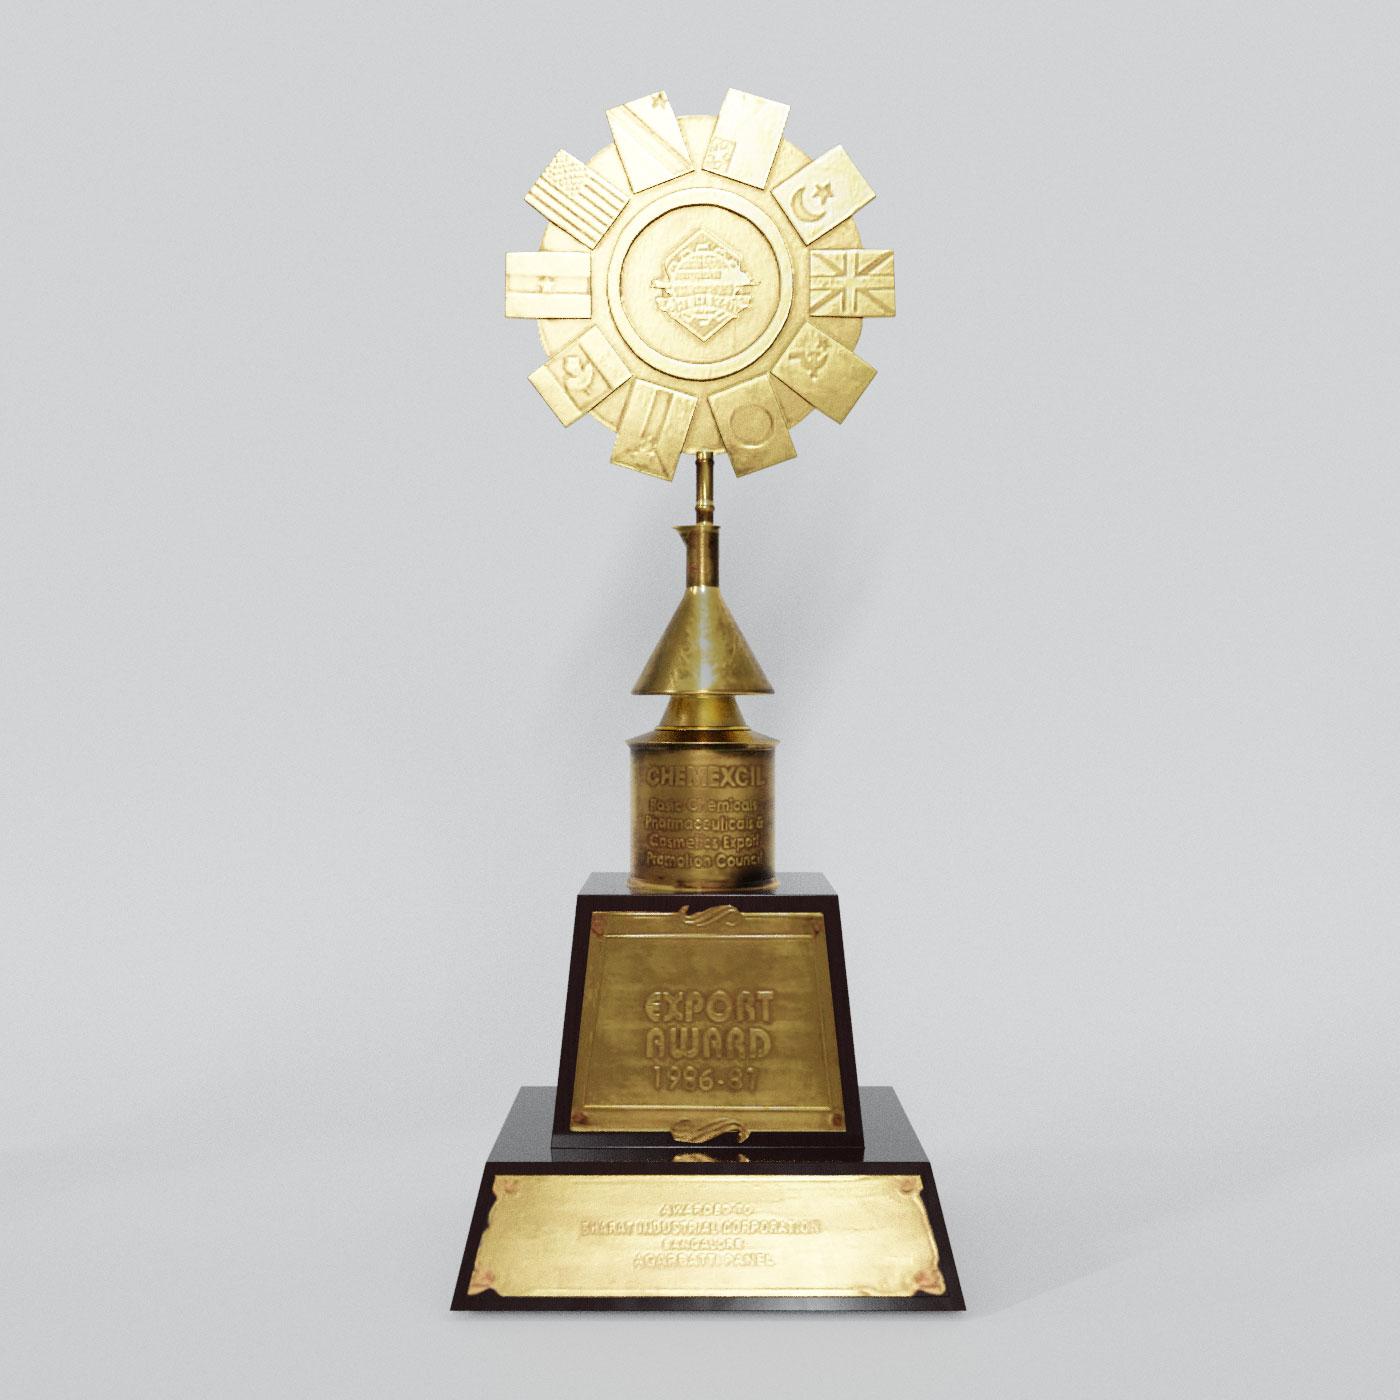 Chemexcil Export Award